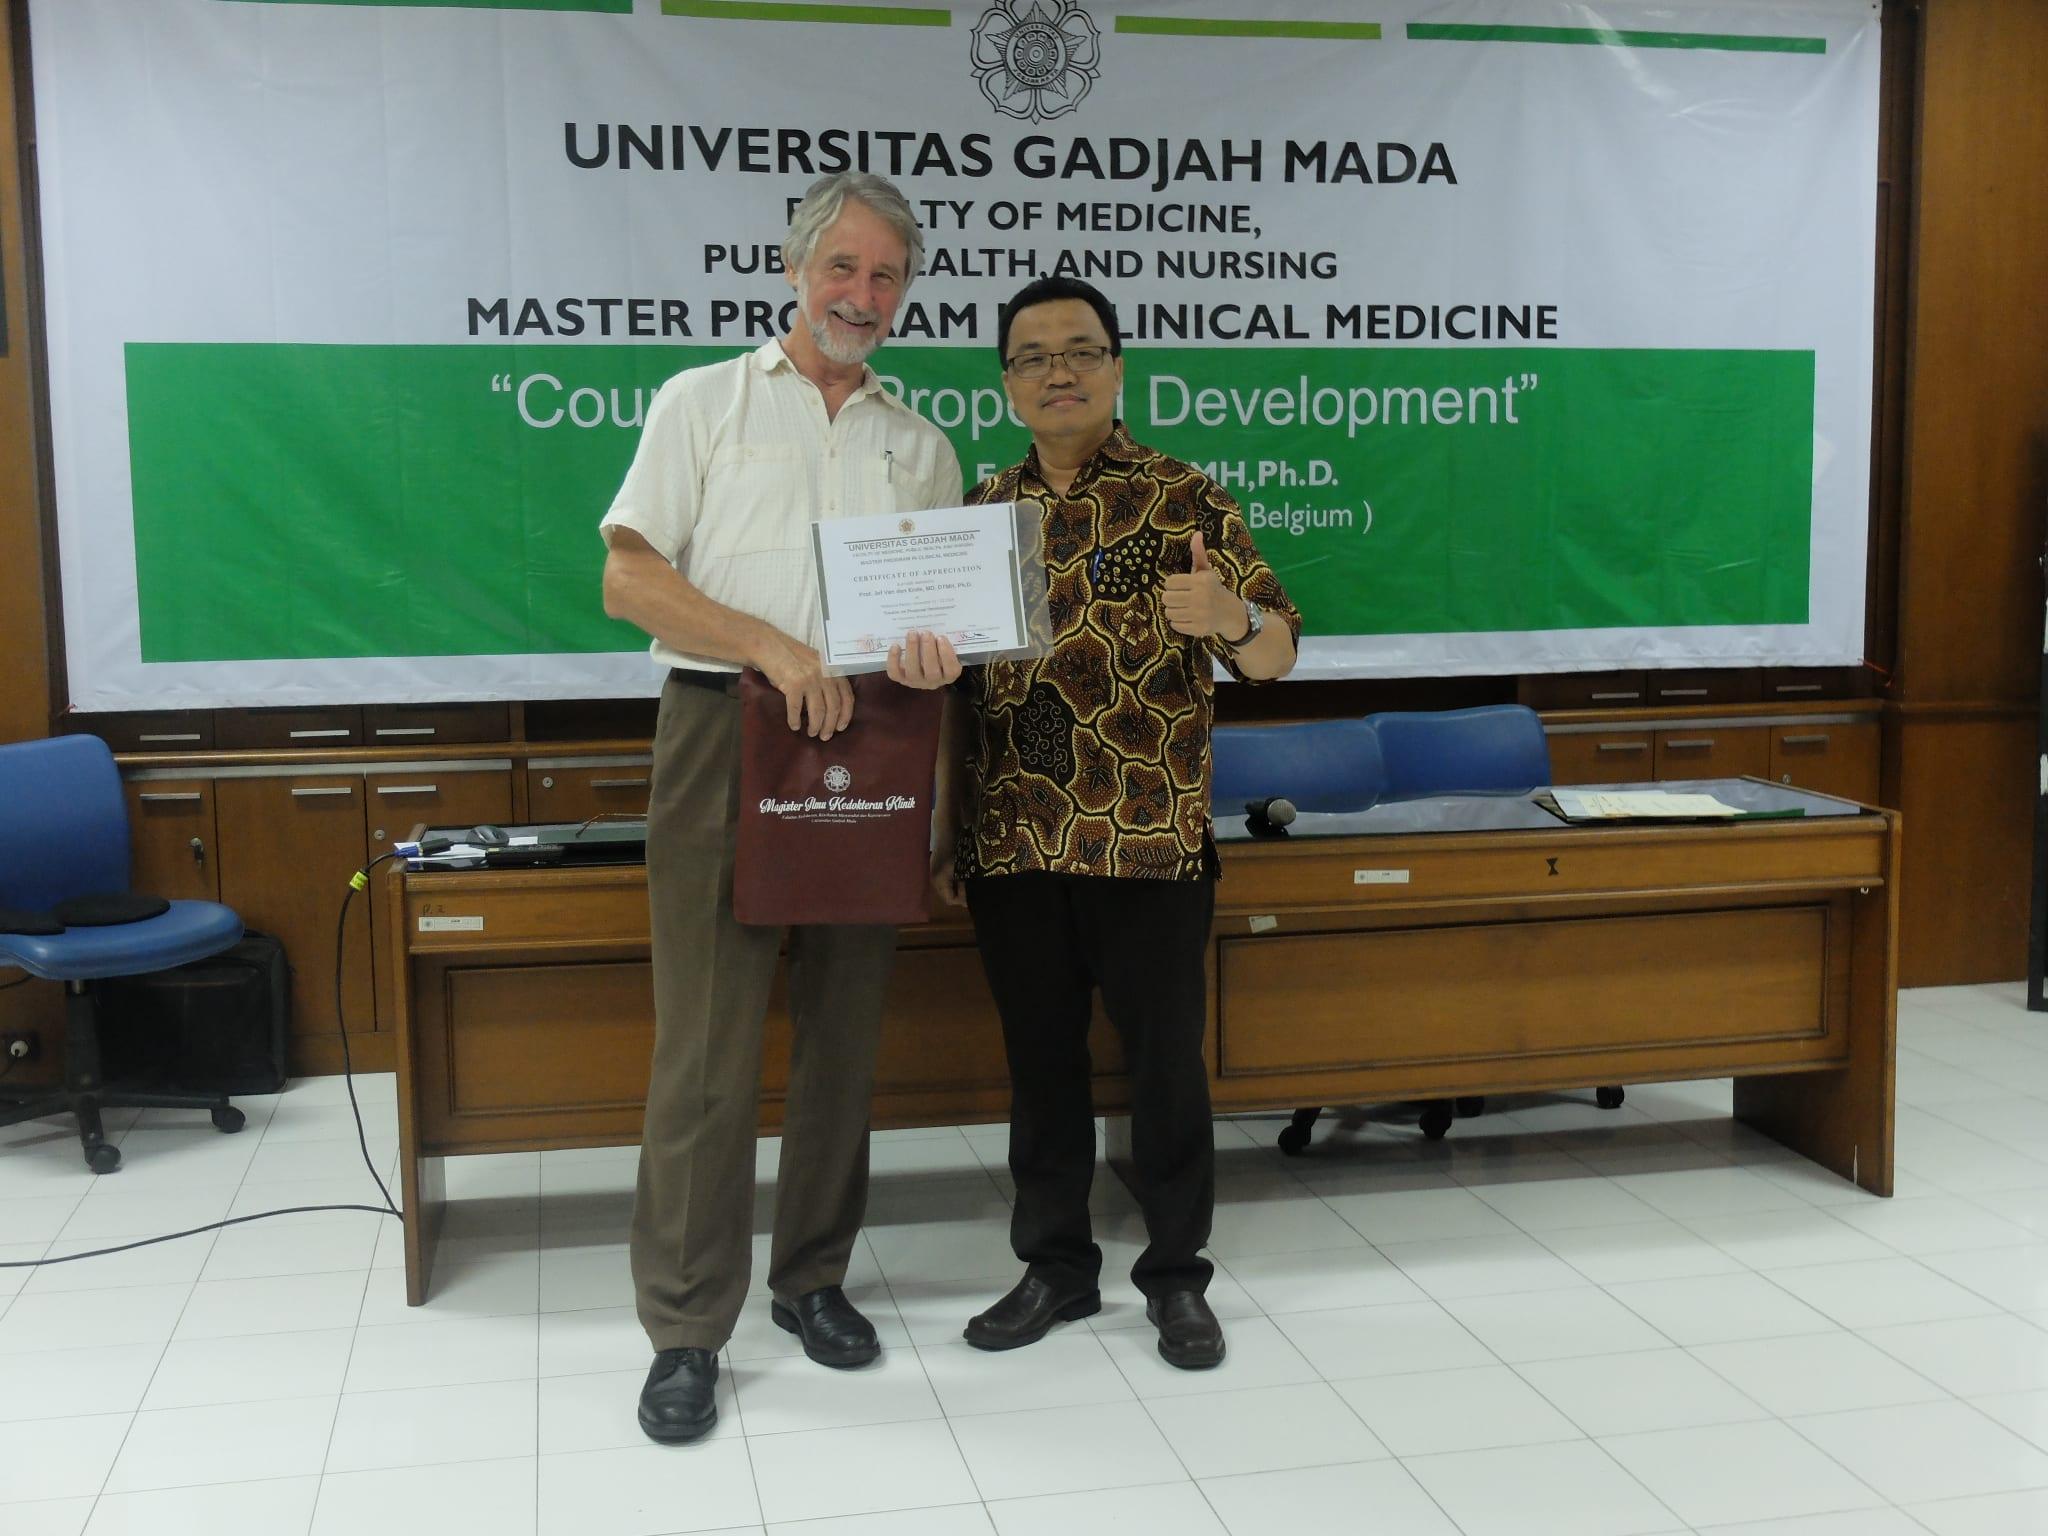 Course on Proposal Development Prof Jeff